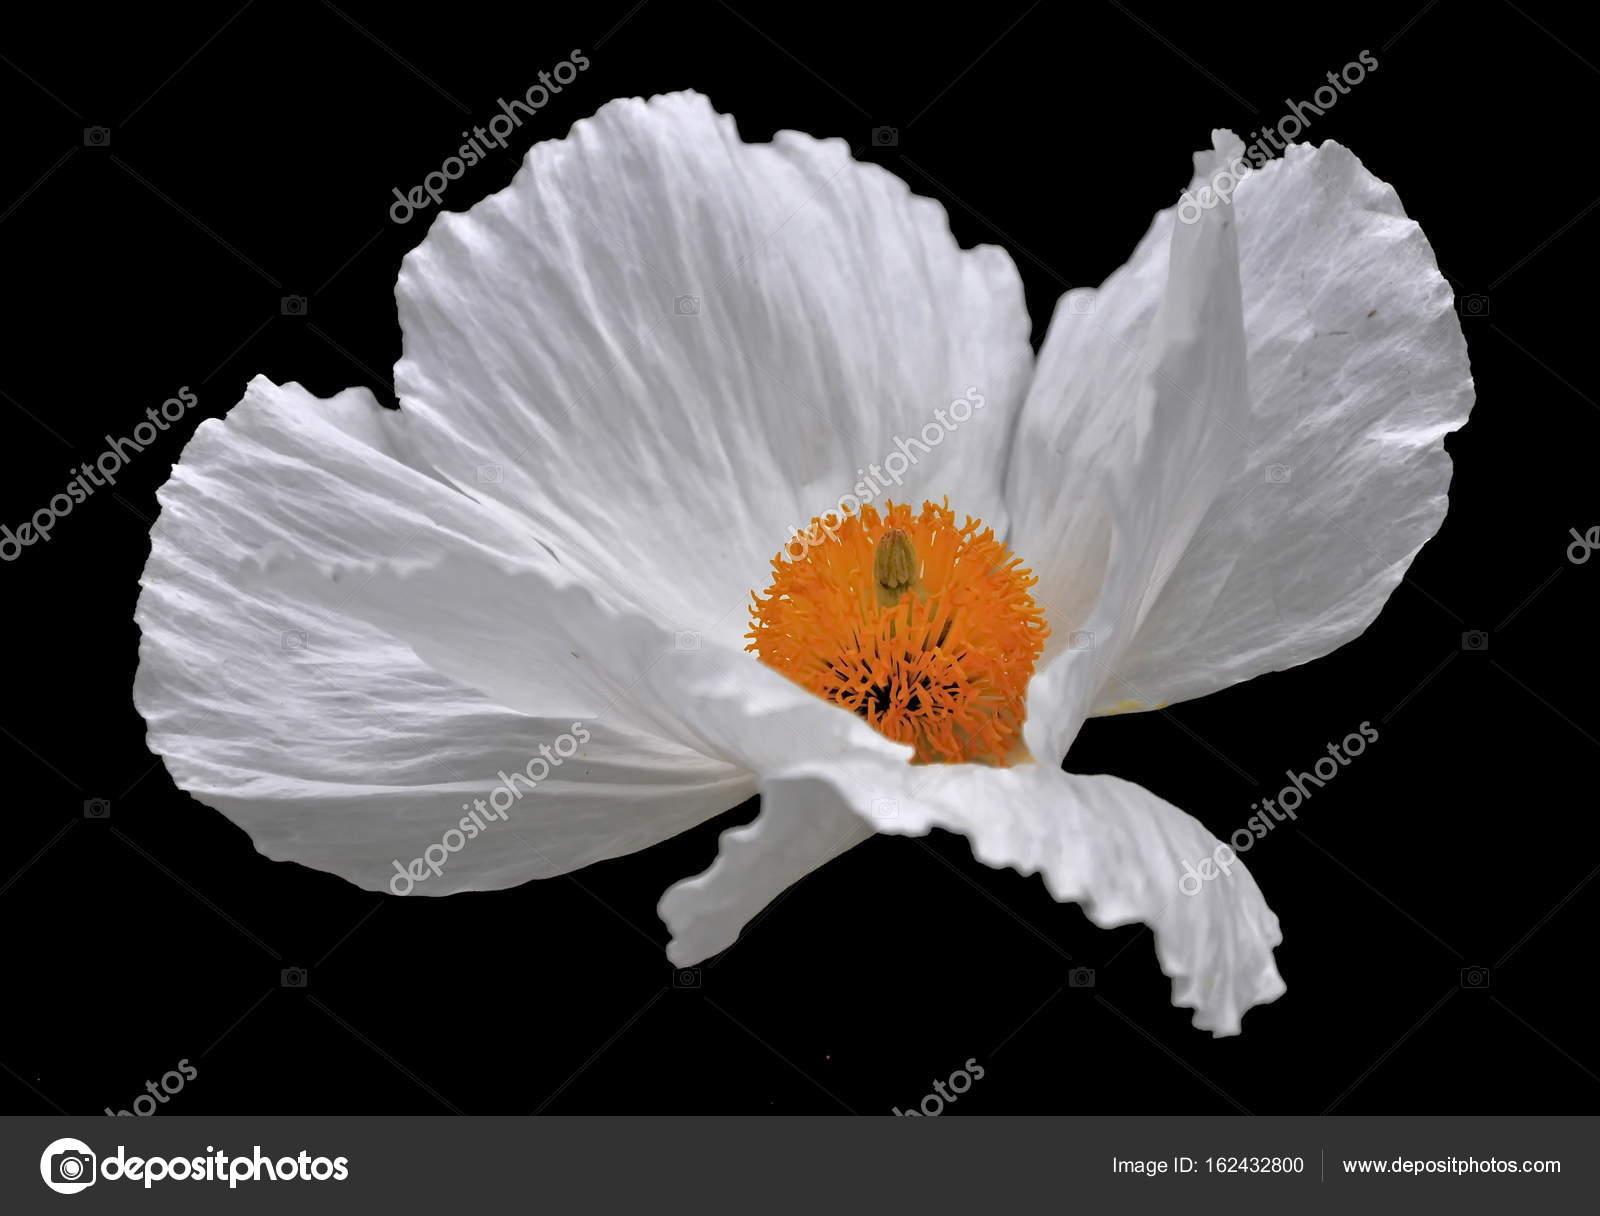 Isolated white flower stock photo sahmay 162432800 isolated white flower stock photo mightylinksfo